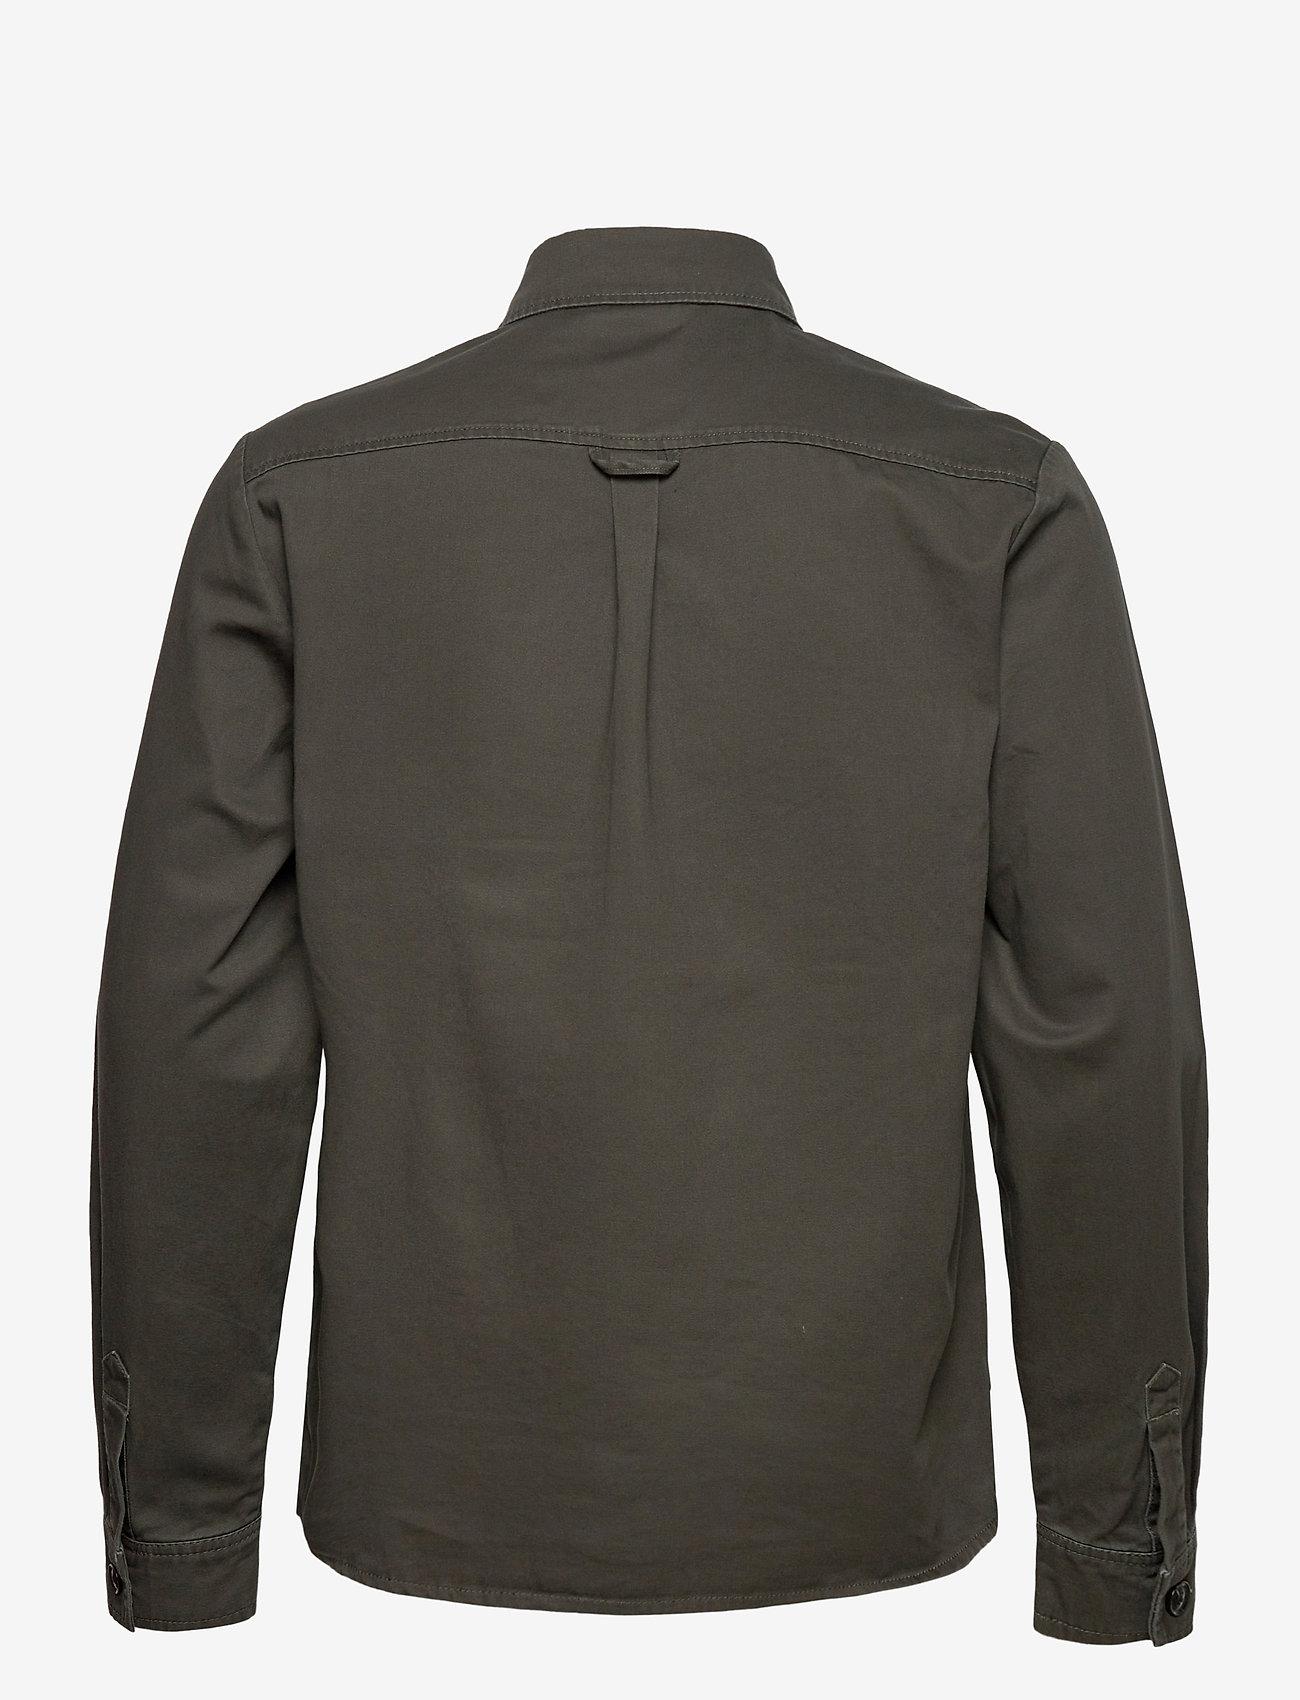 Solid 6209630, Jacket - SDLoke Overshirt - Jakker og frakker FOREST NIG - Menn Klær